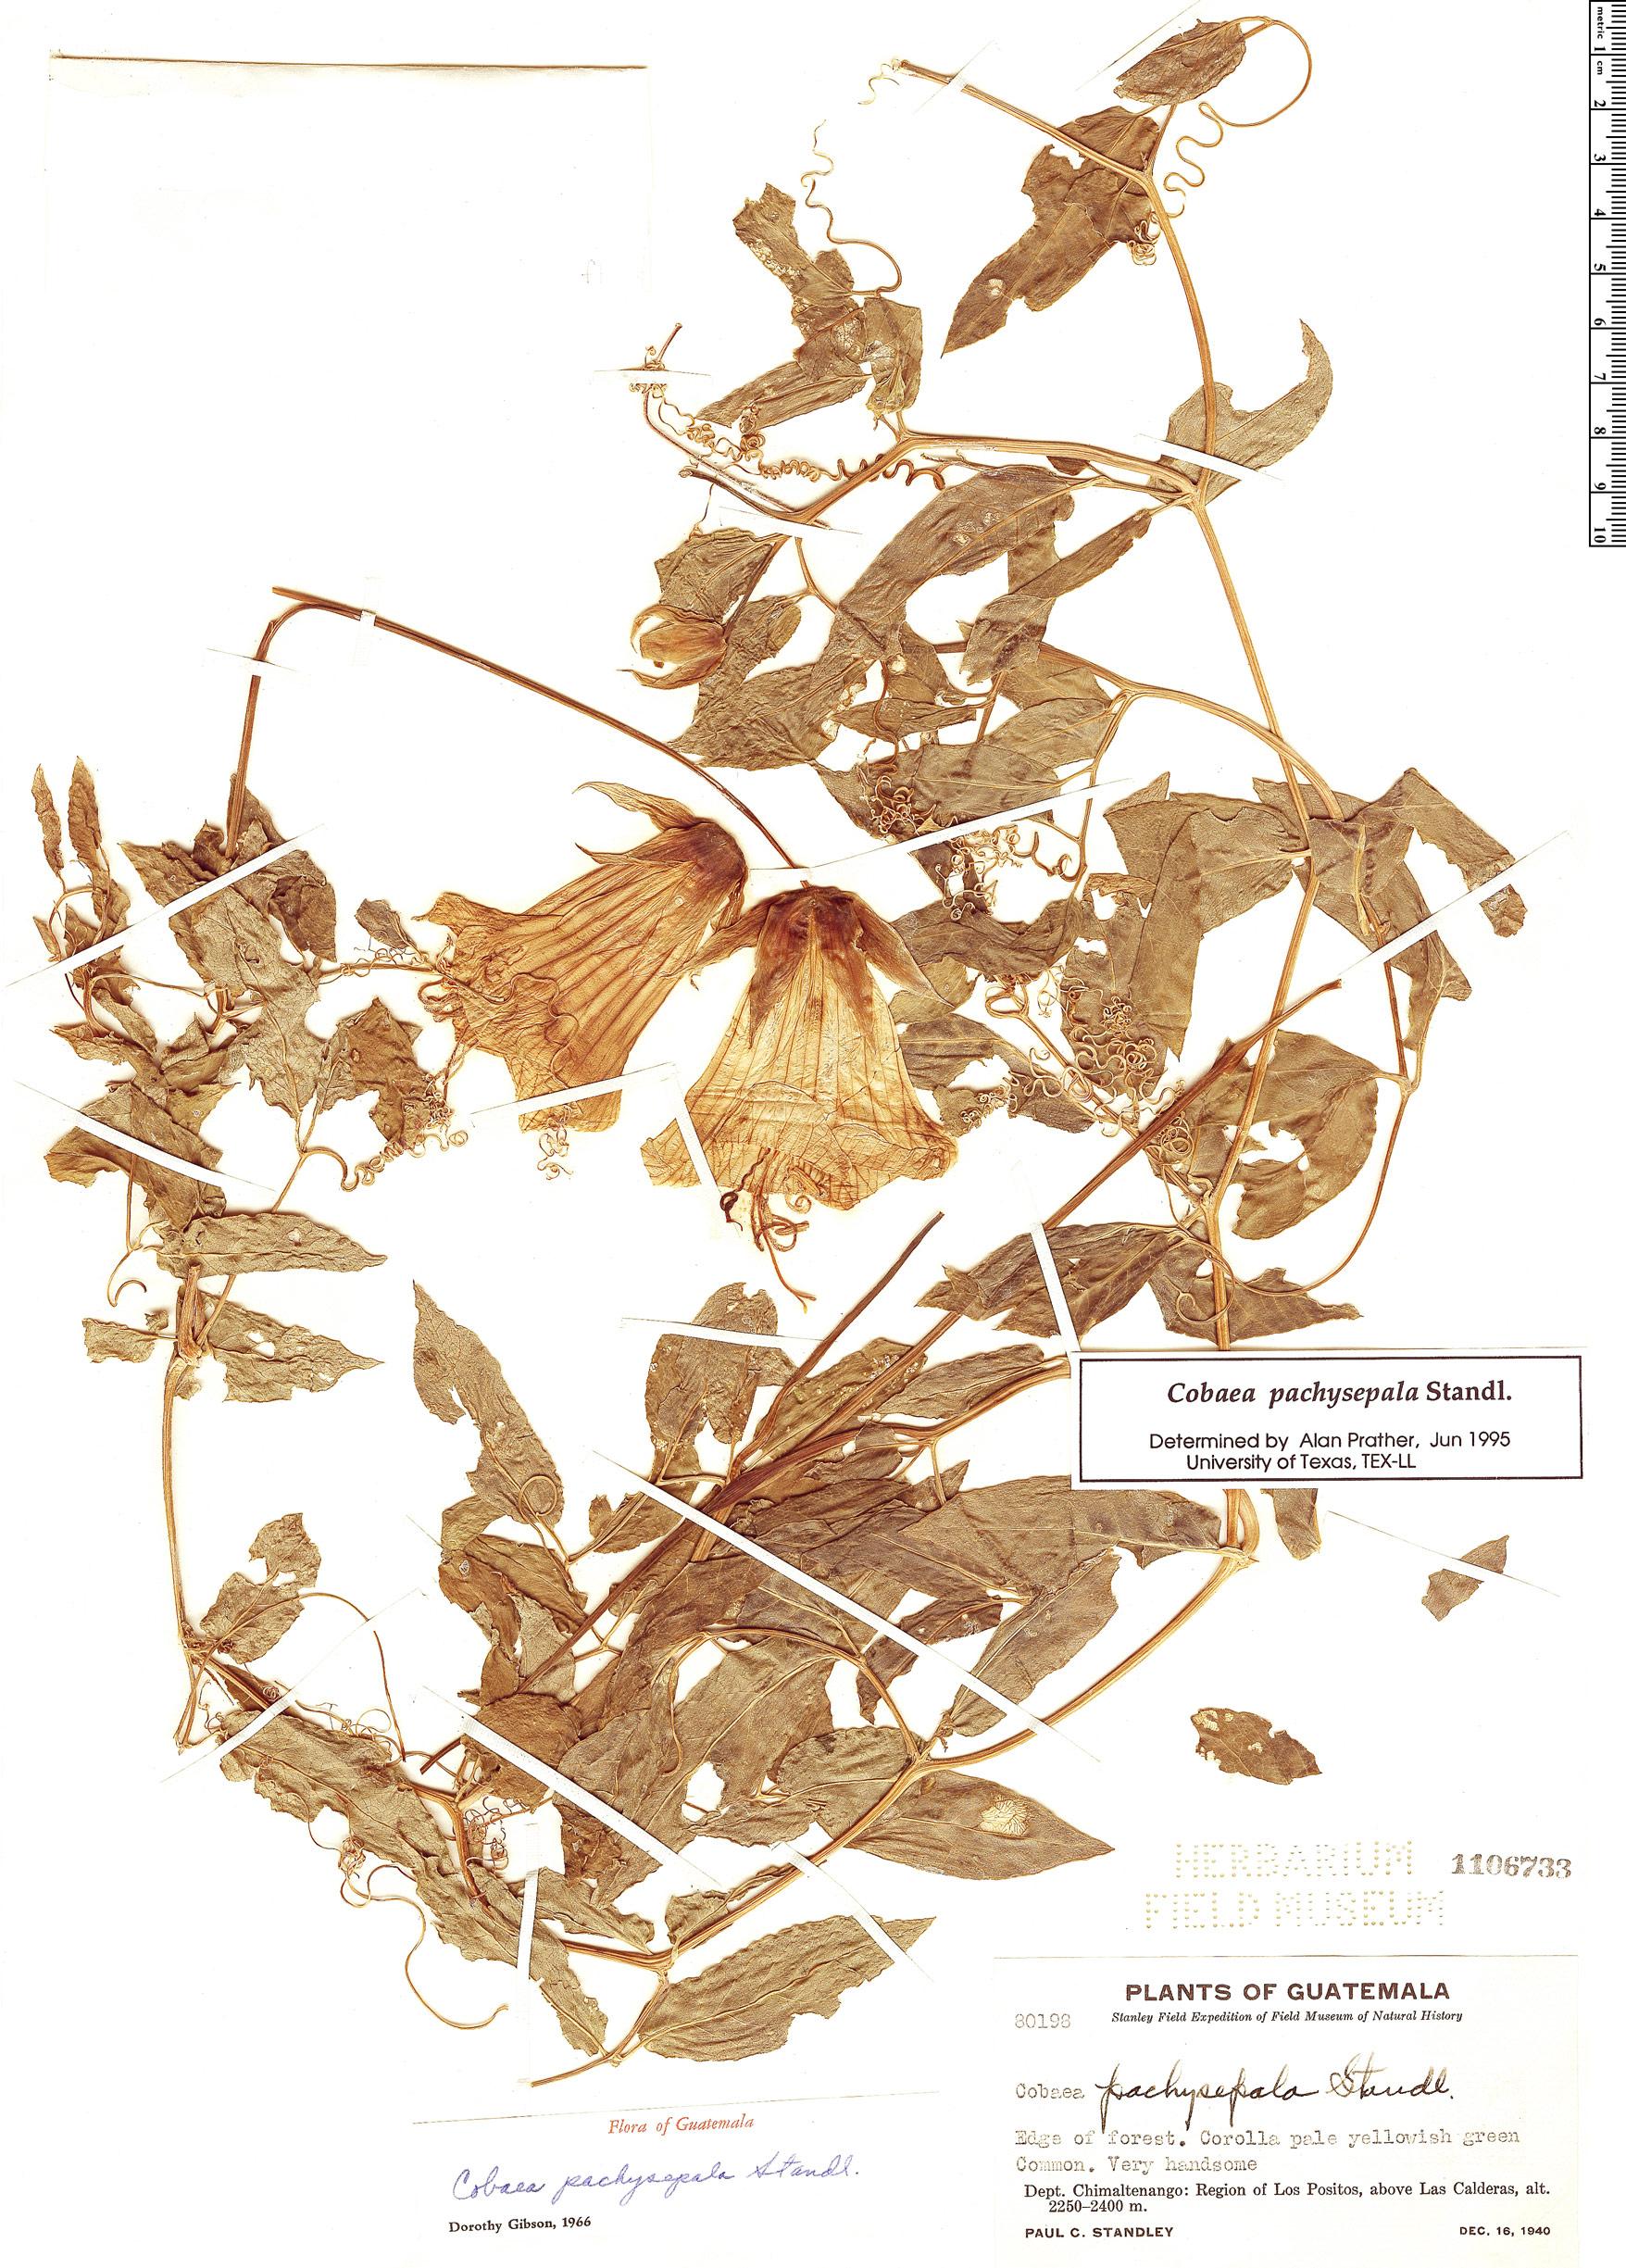 Specimen: Cobaea pachysepala